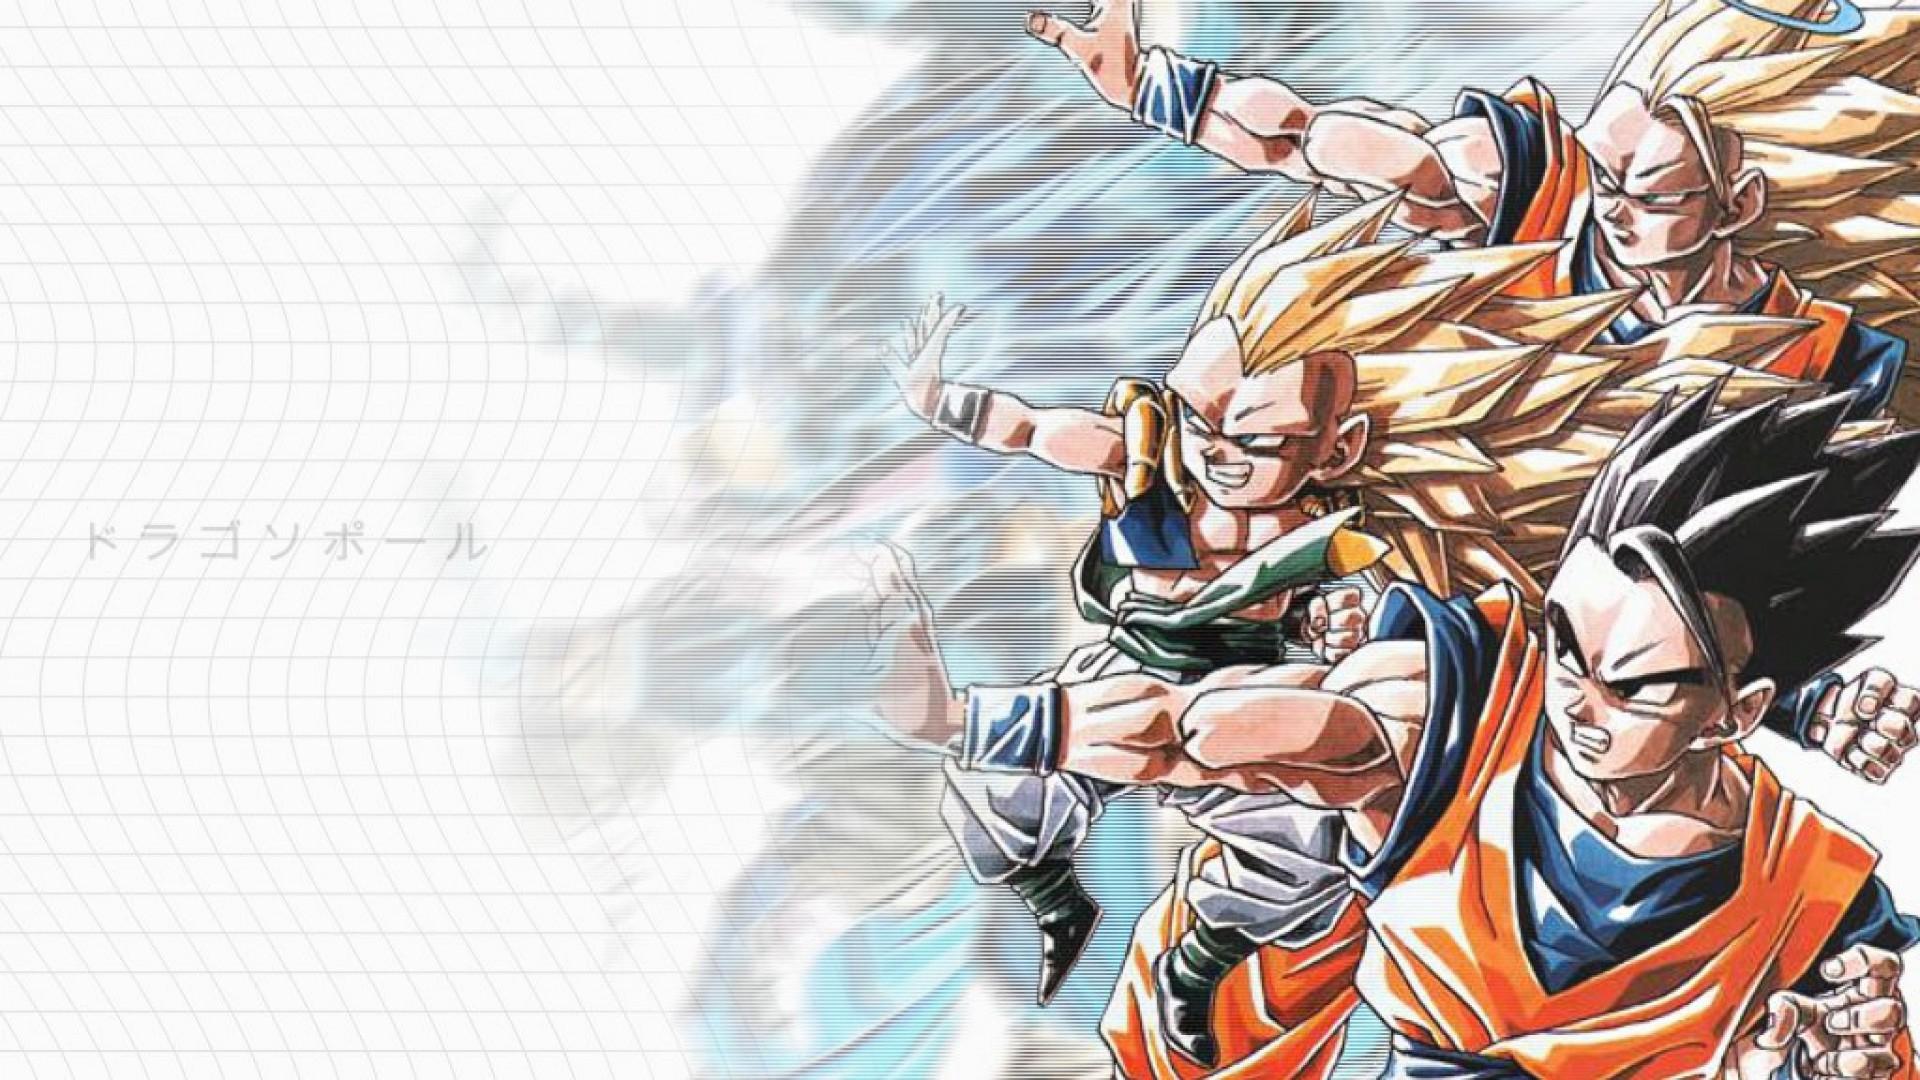 Dragon Ball Z Wallpapers HD Goku download 1920x1080